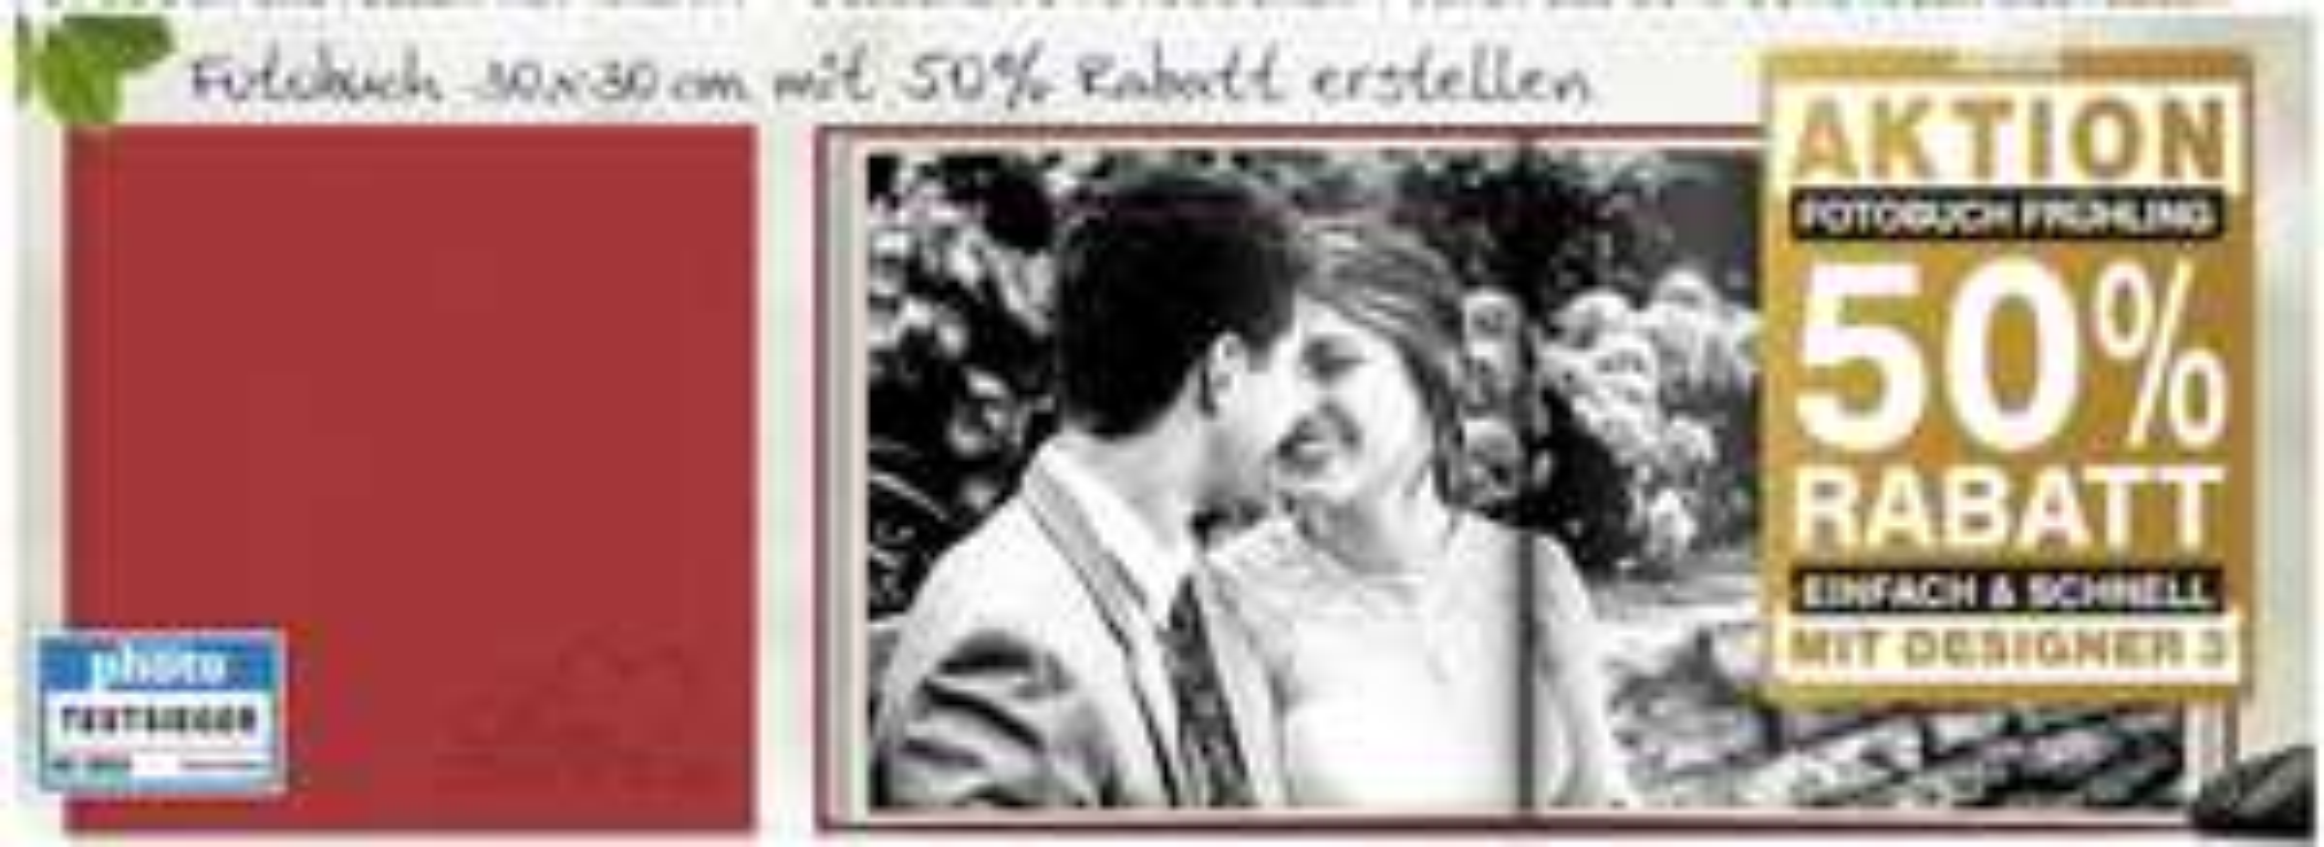 Fotobuch mit 50% Rabatt - diverse Formate